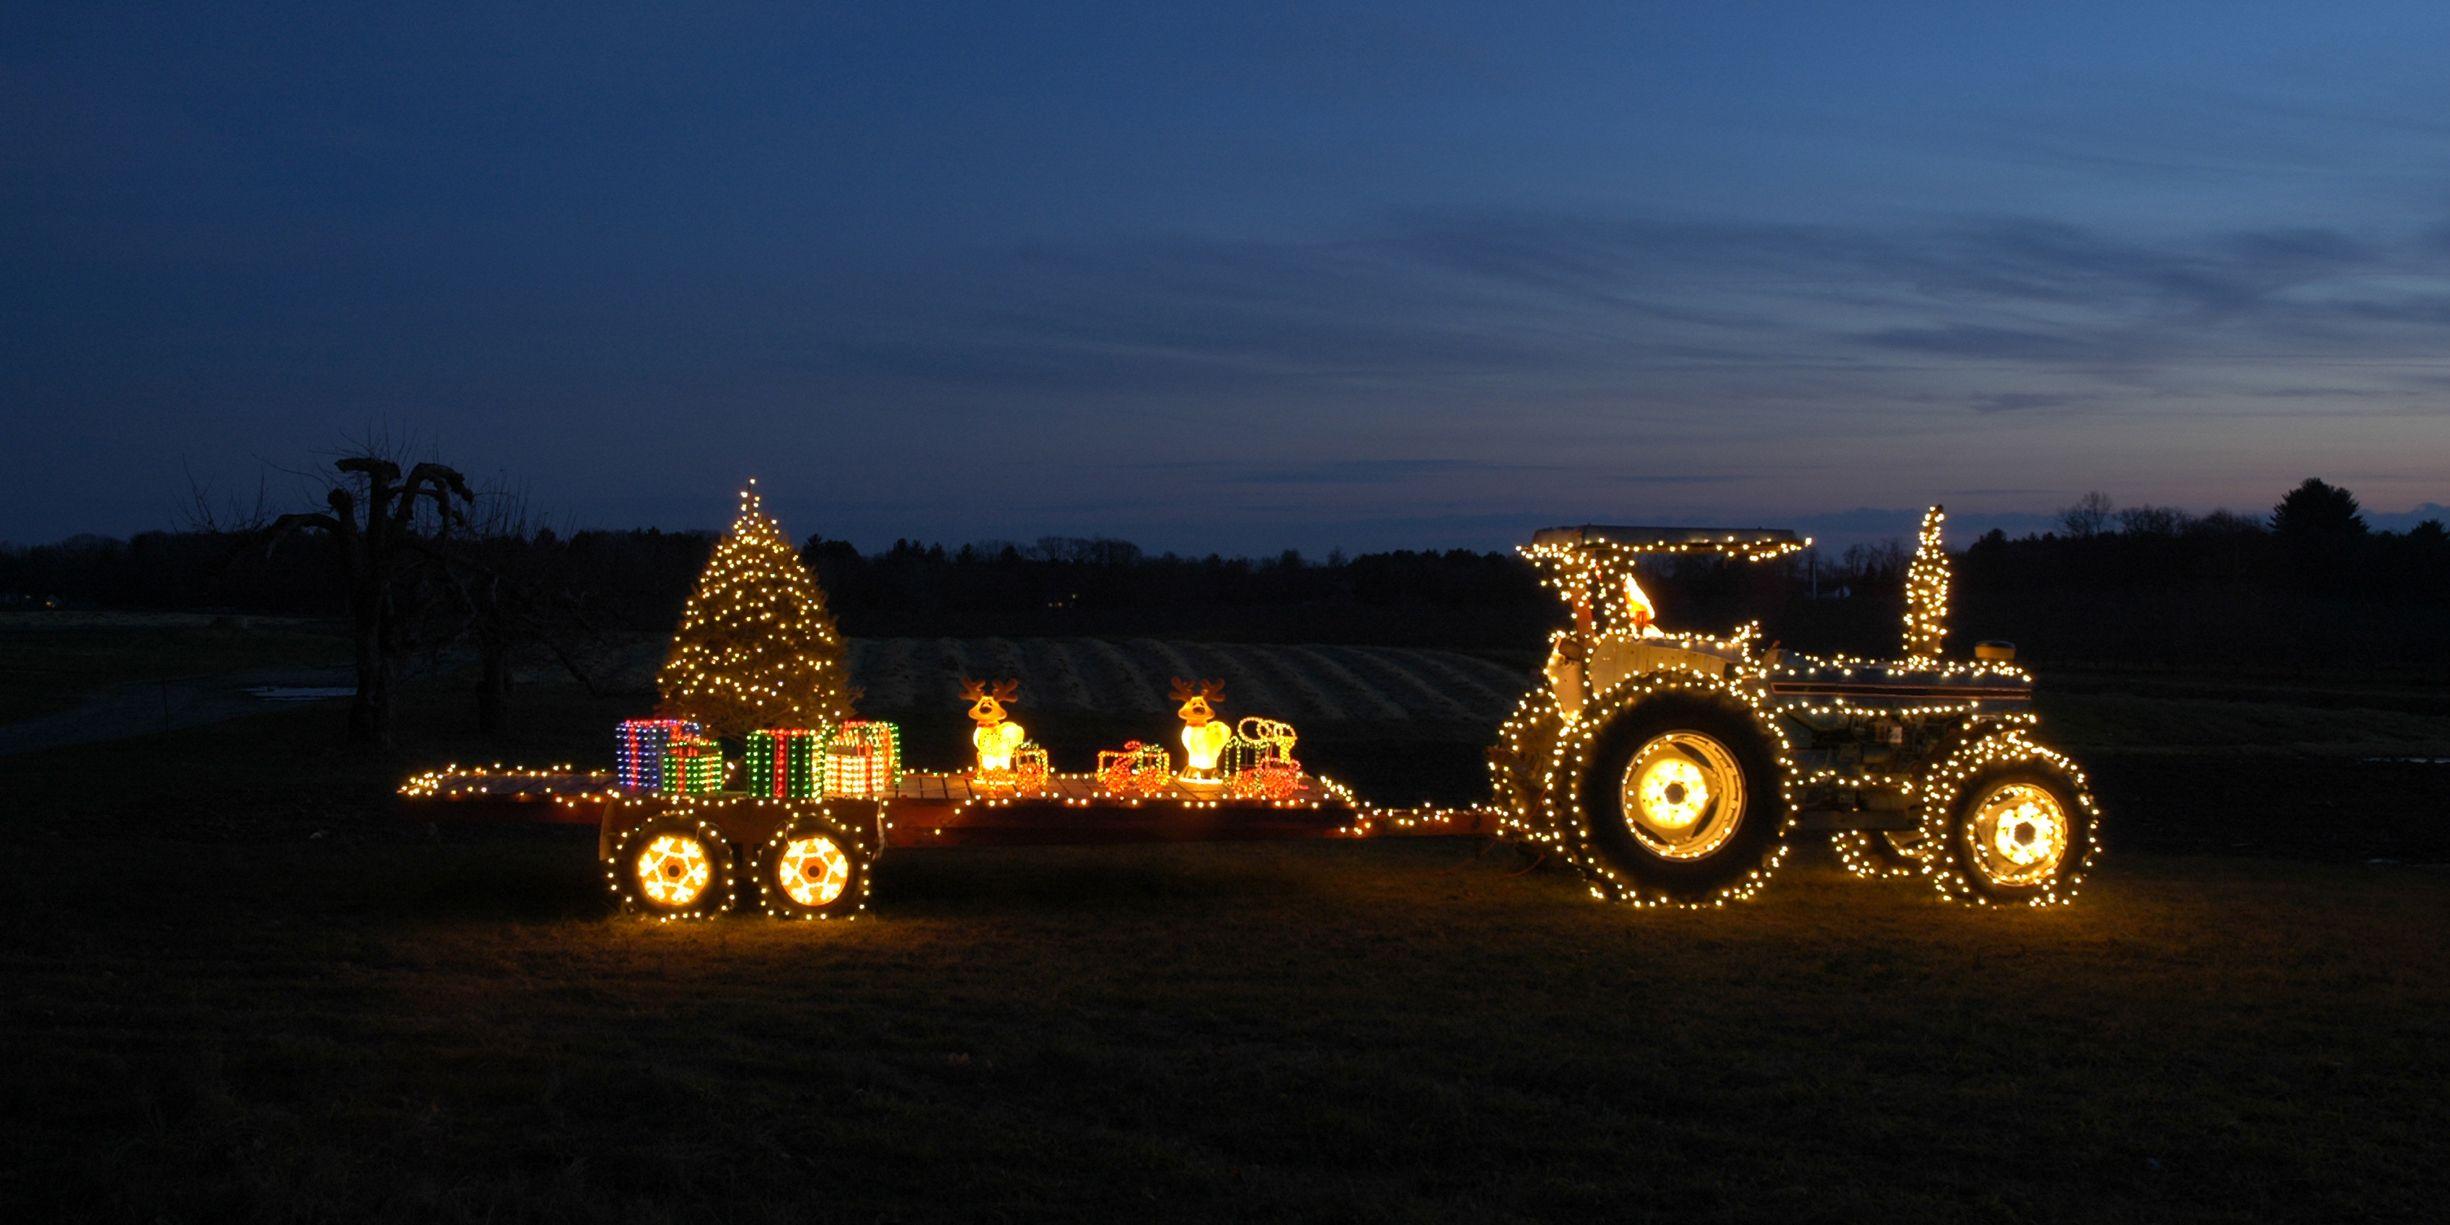 Christmas Diy Decorations